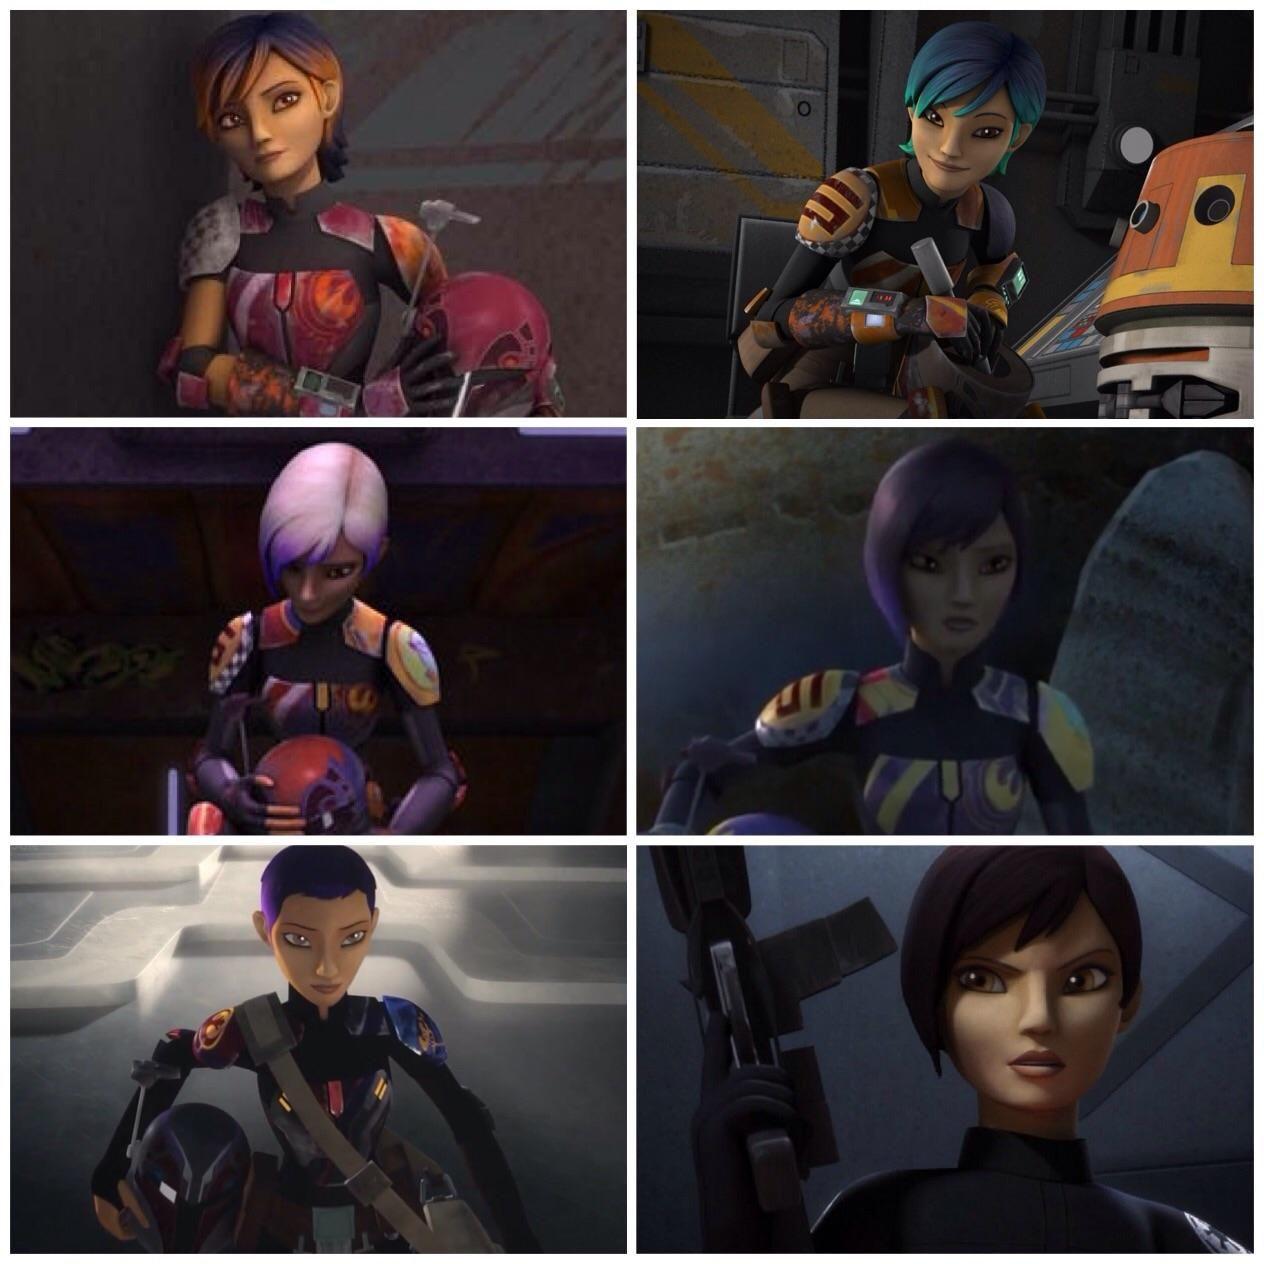 Pin by Sam on MandoStuff | Star wars rebels characters ...